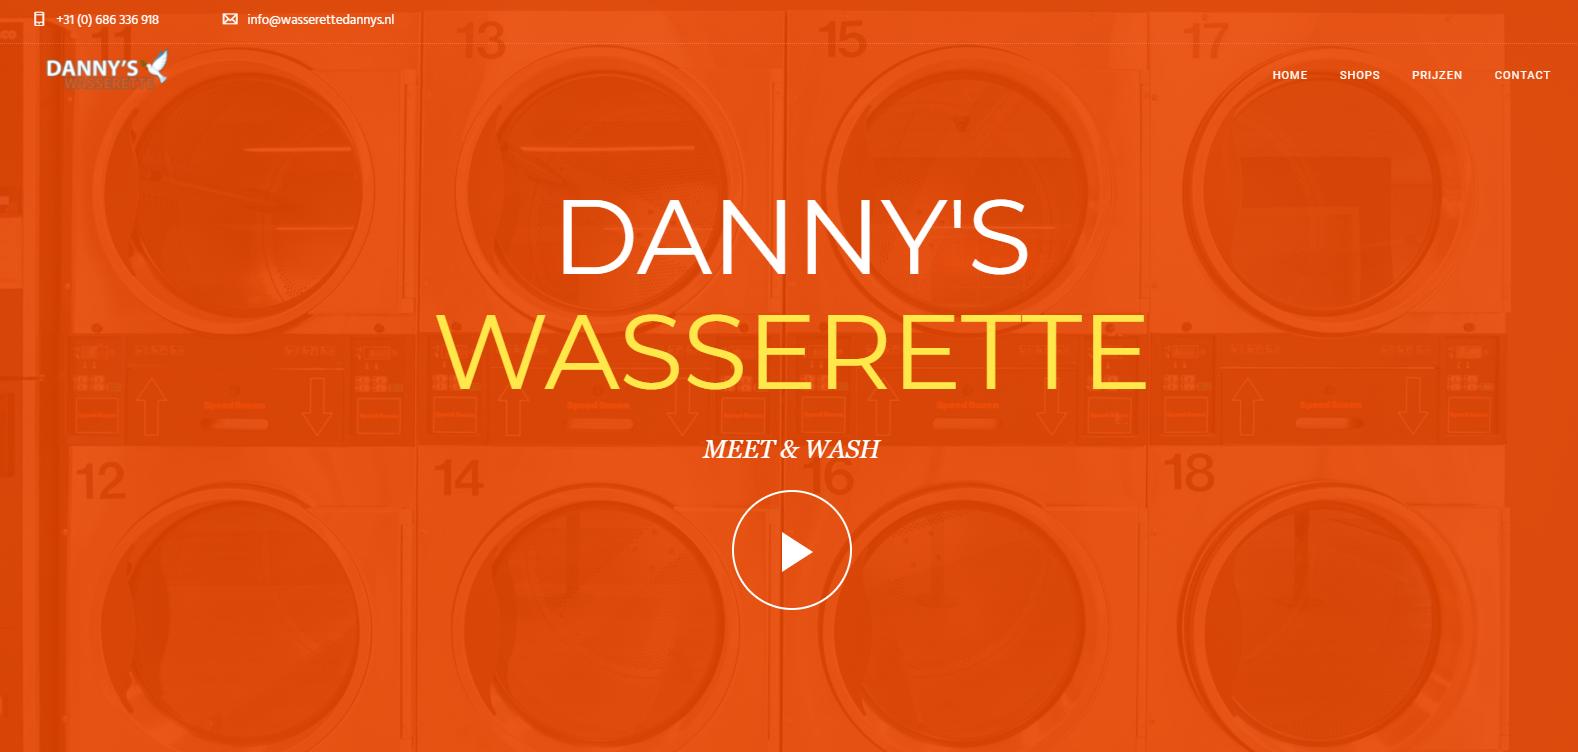 Danny's wasserette webdesign